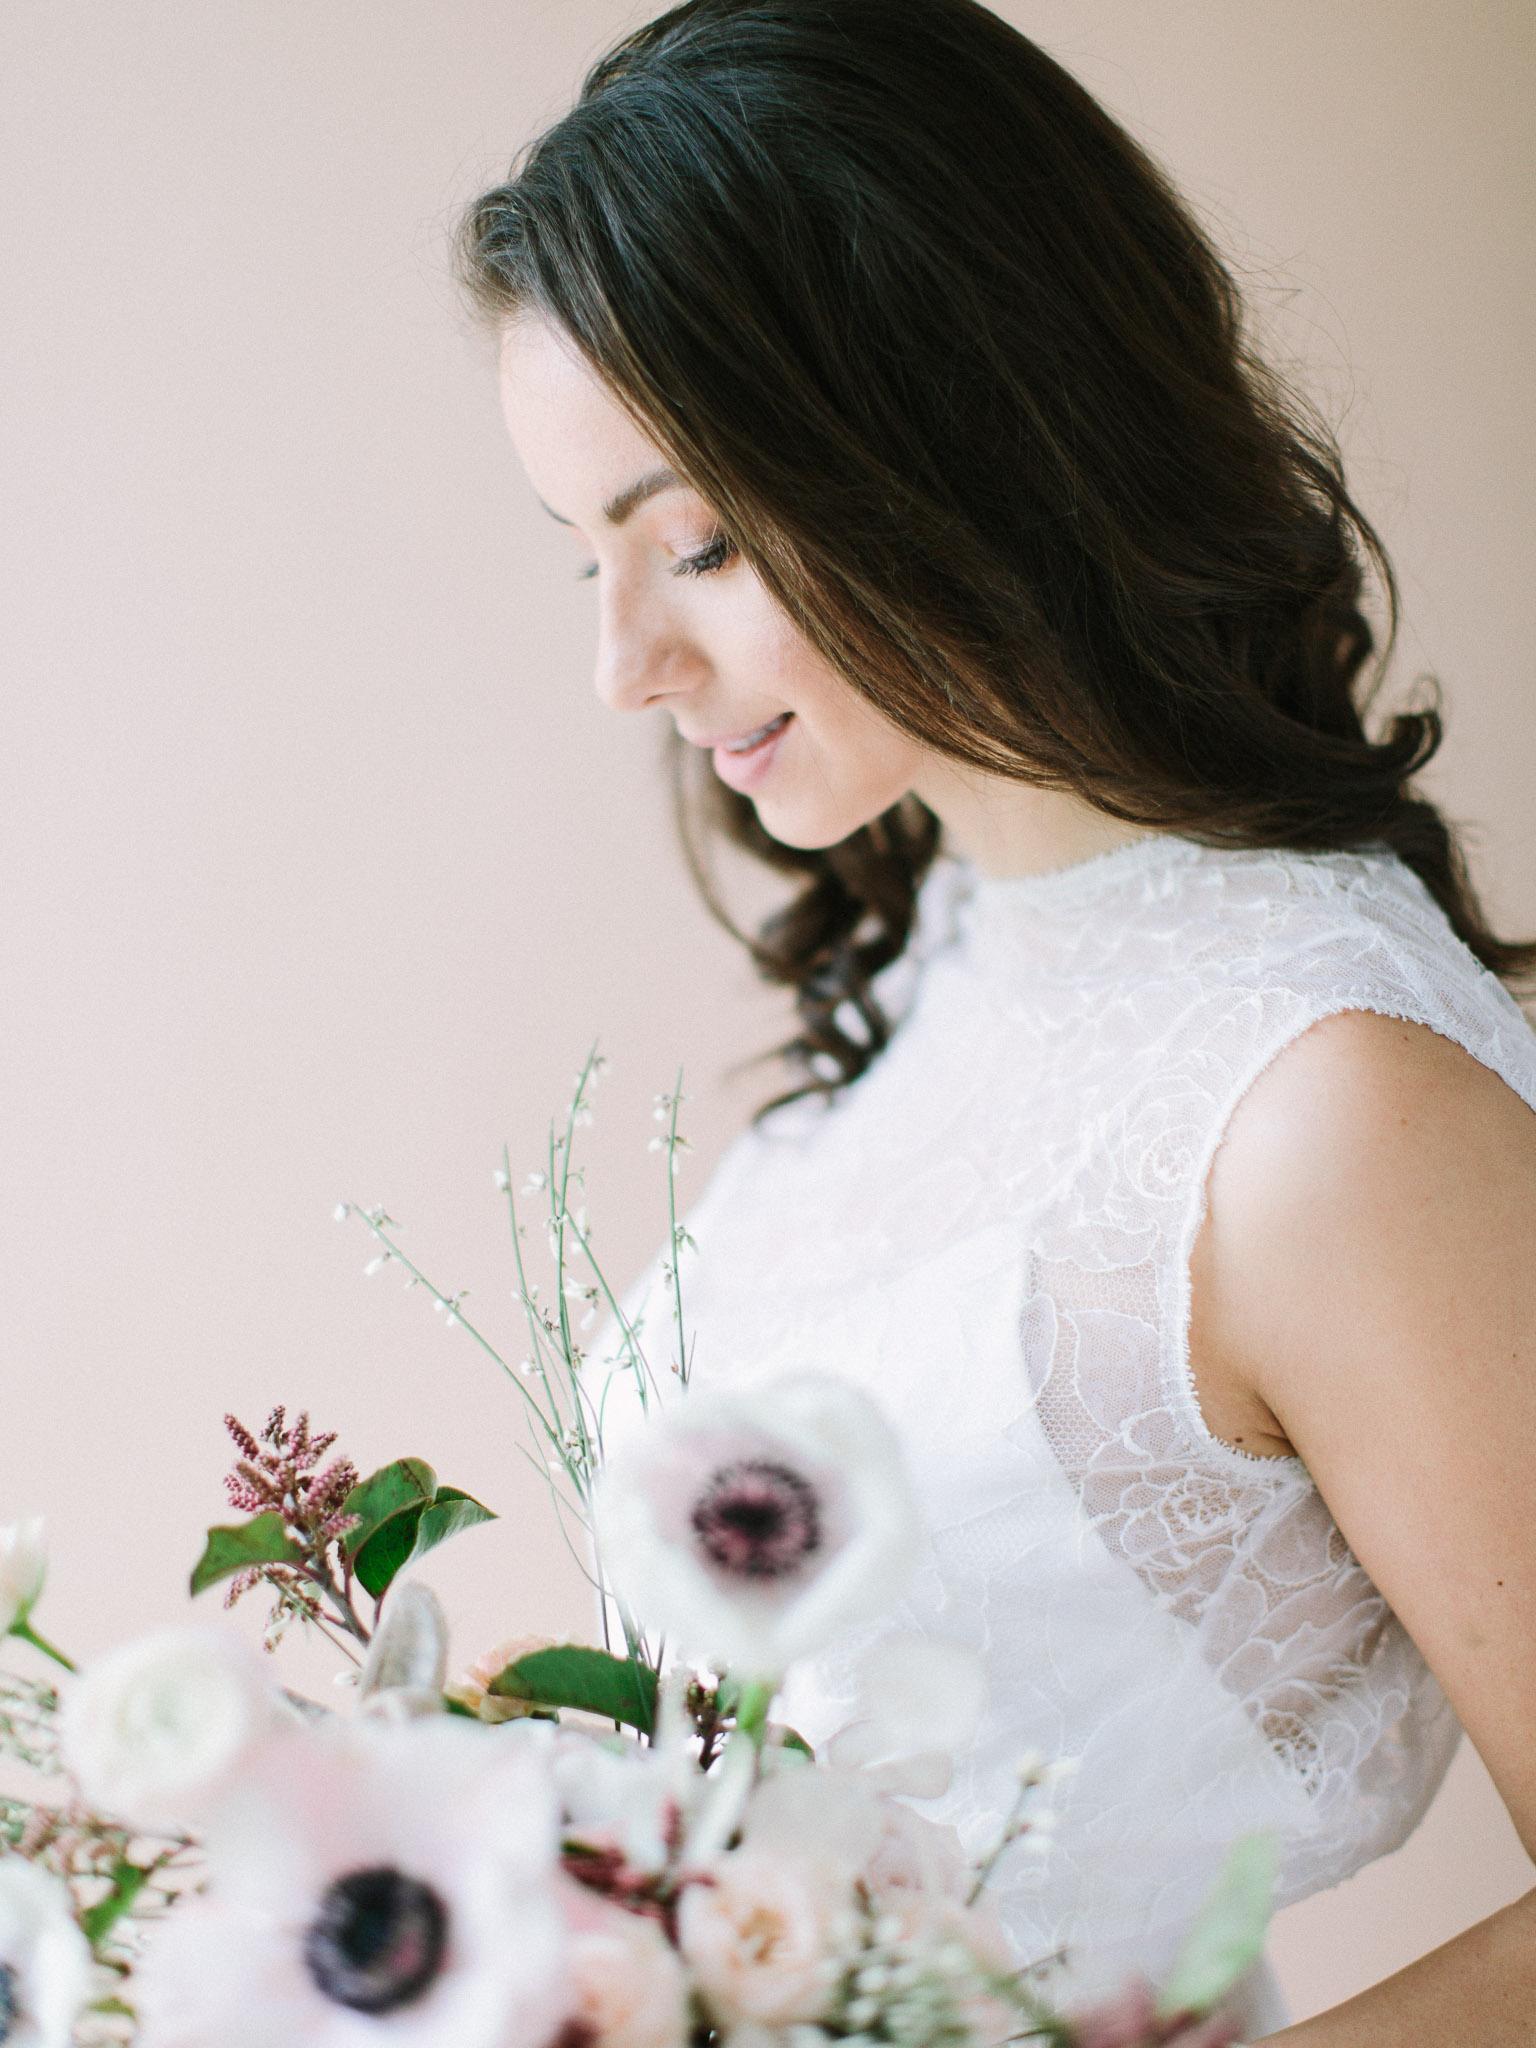 ModernNaturalStyledShoot_MaricleKang_Vancouver Wedding Photographer__0030.jpg